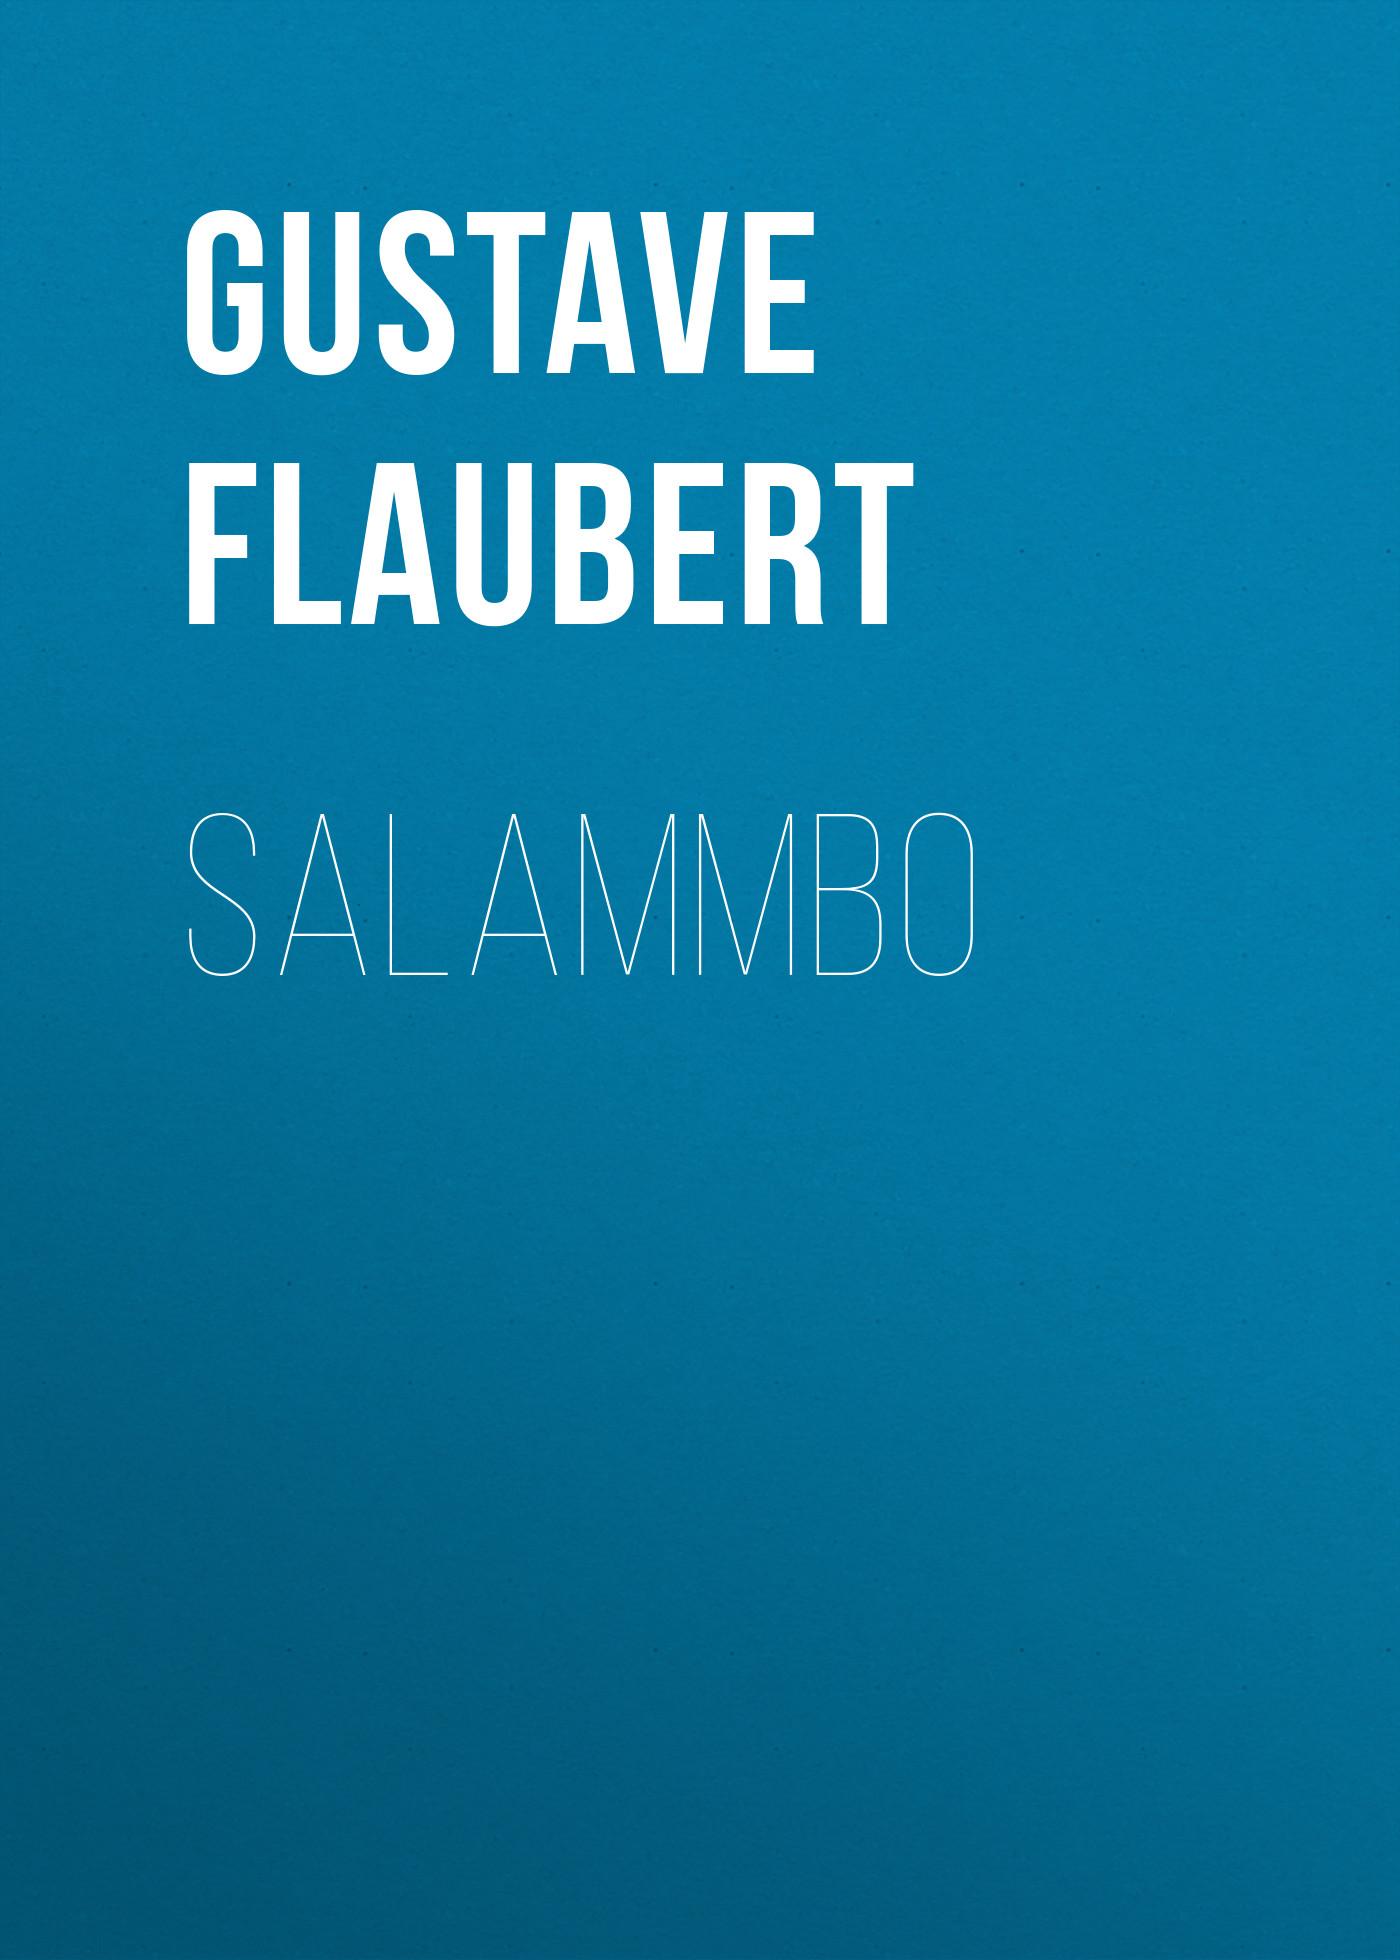 Gustave Flaubert Salammbo arthur hamilton sources of the religious element in flaubert s salammbo french edition